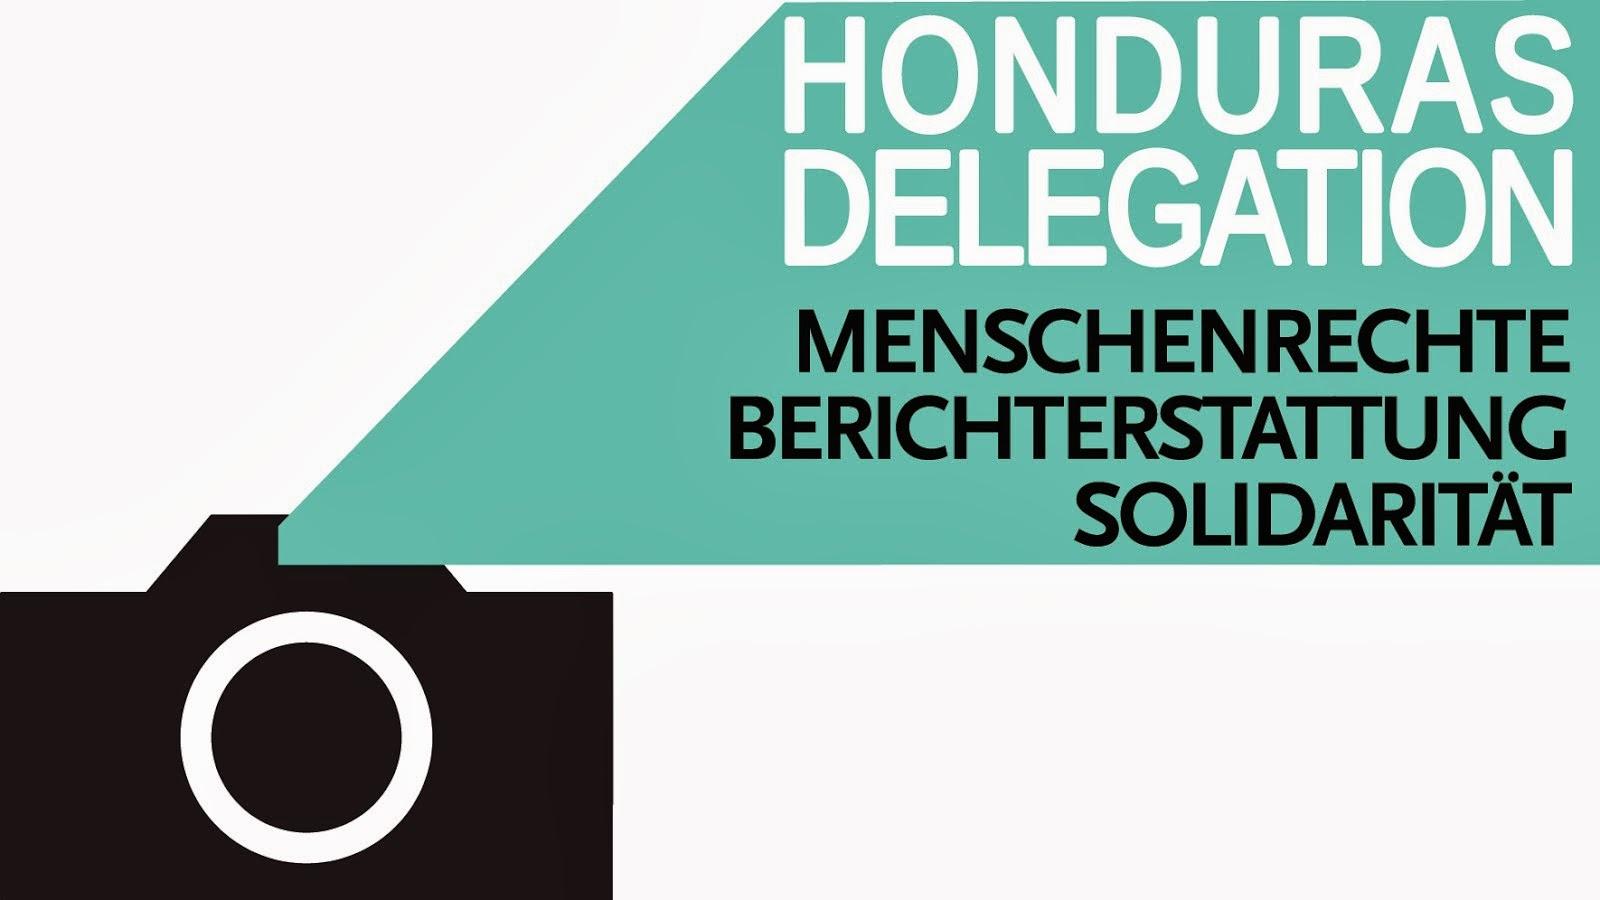 Berichte der Menschenrechts-delegation November 2013